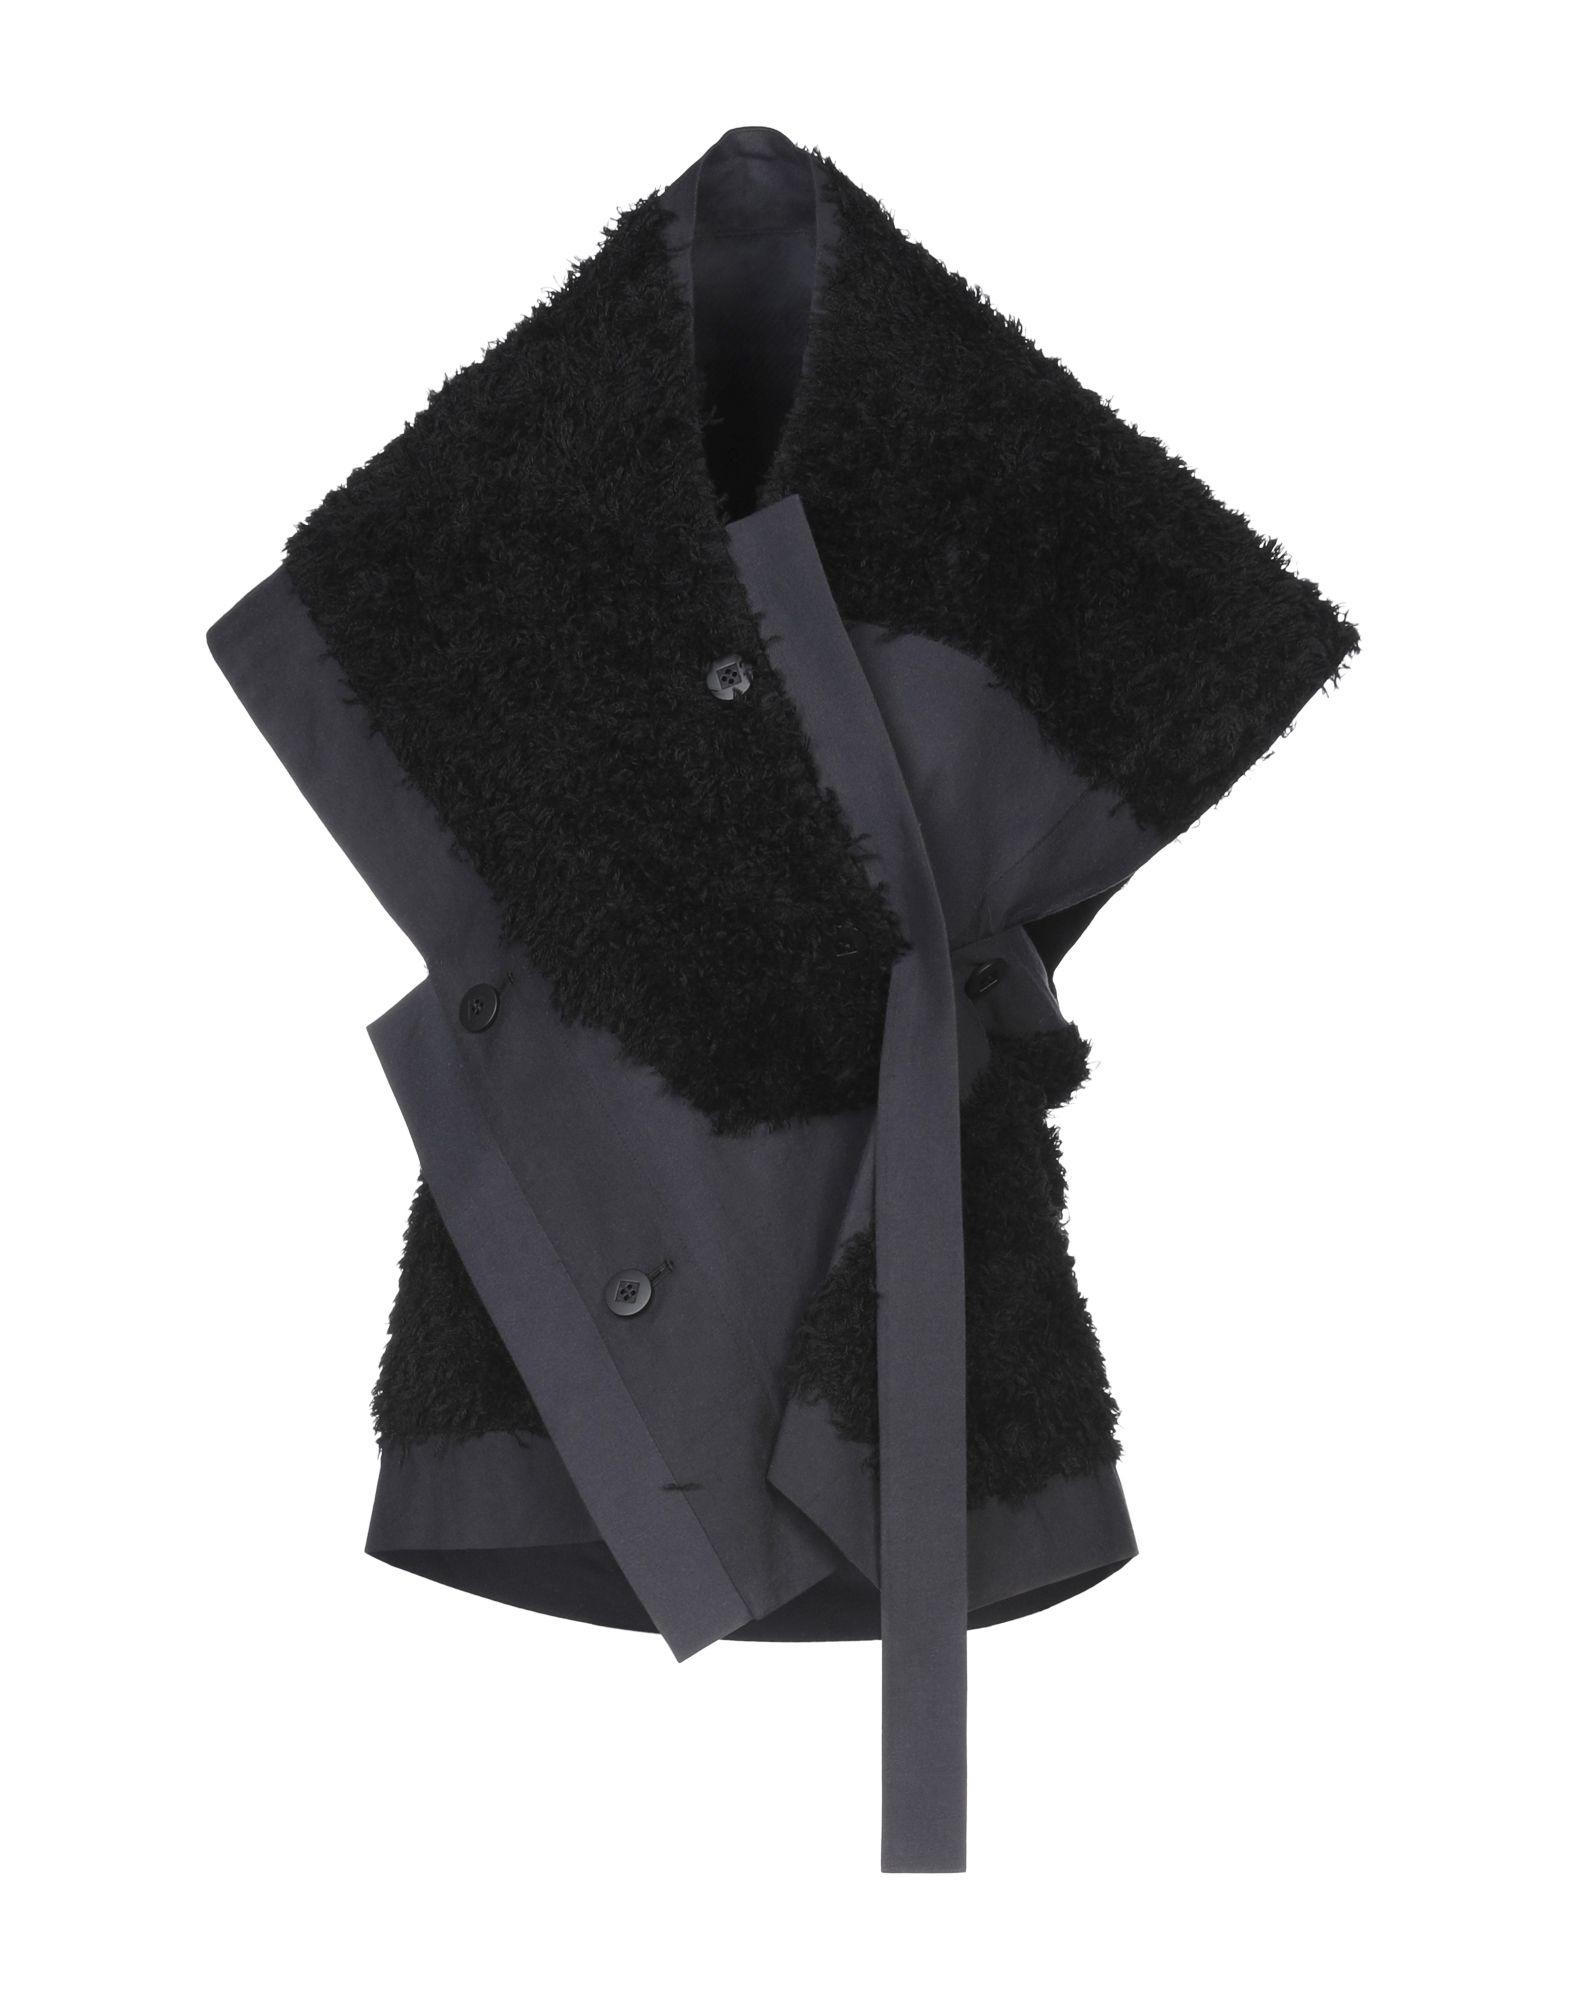 issey miyake cauliflower легкое пальто ISSEY MIYAKE Легкое пальто